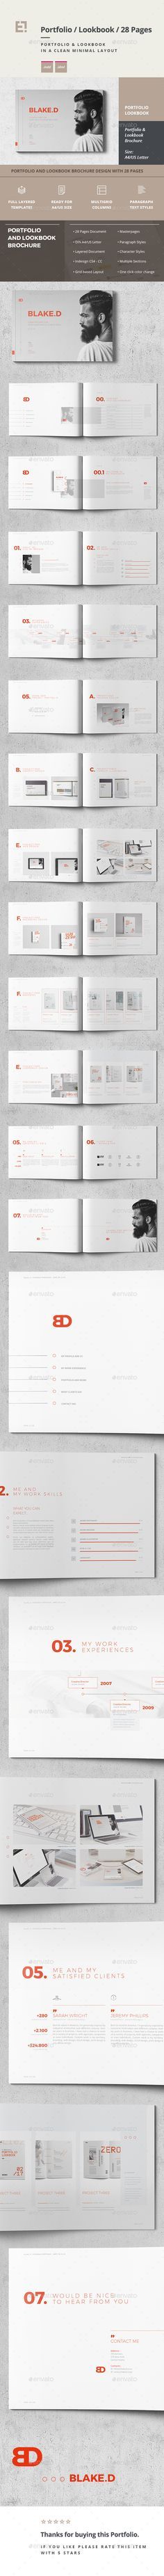 Portfolio - Portfolio Brochure Template InDesign INDD - 28 Pages, A4 & US Letter Size